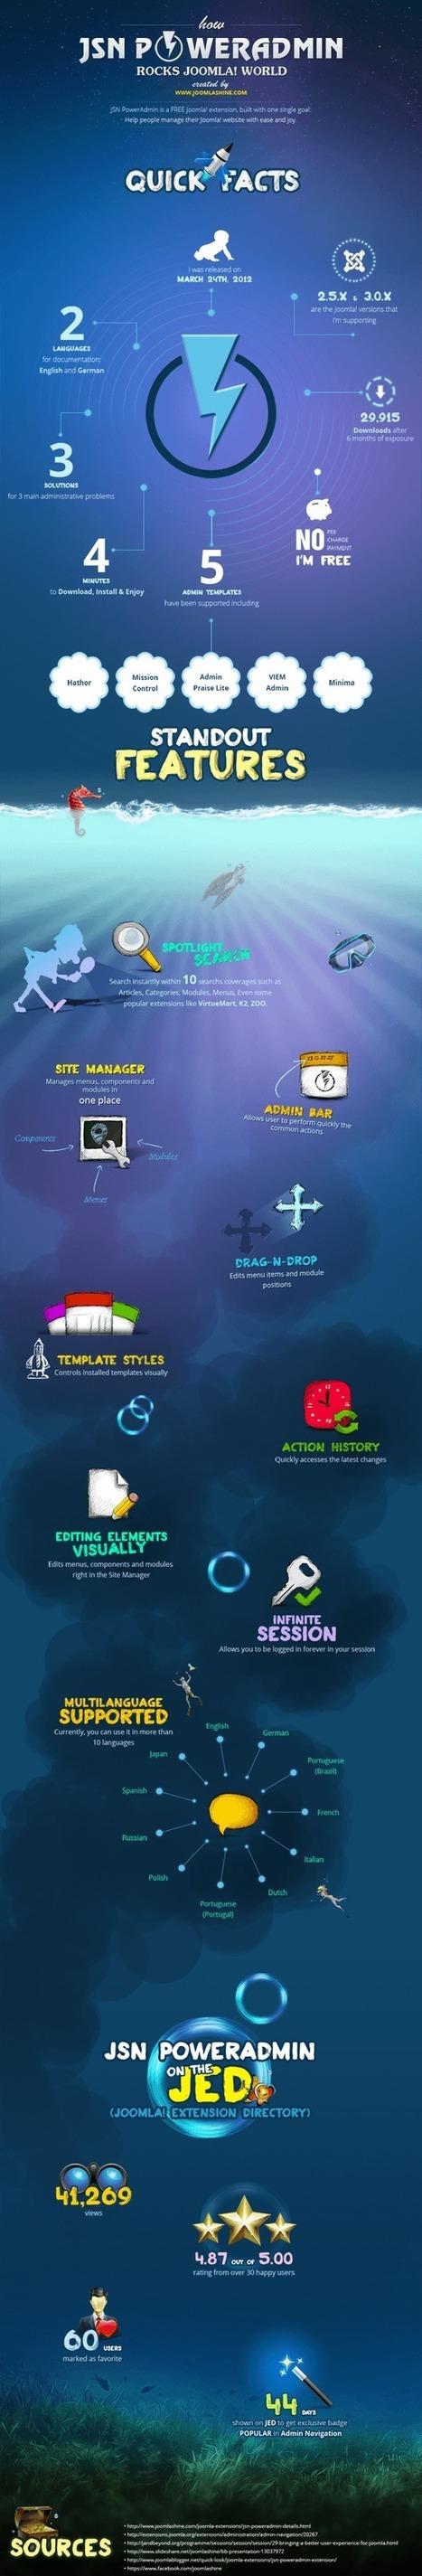 [Infographic] Discover how JSN PowerAdmin rocks Joomla! world | [Infographic] Discover how JSN PowerAdmin rocks Joomla! world | Scoop.it